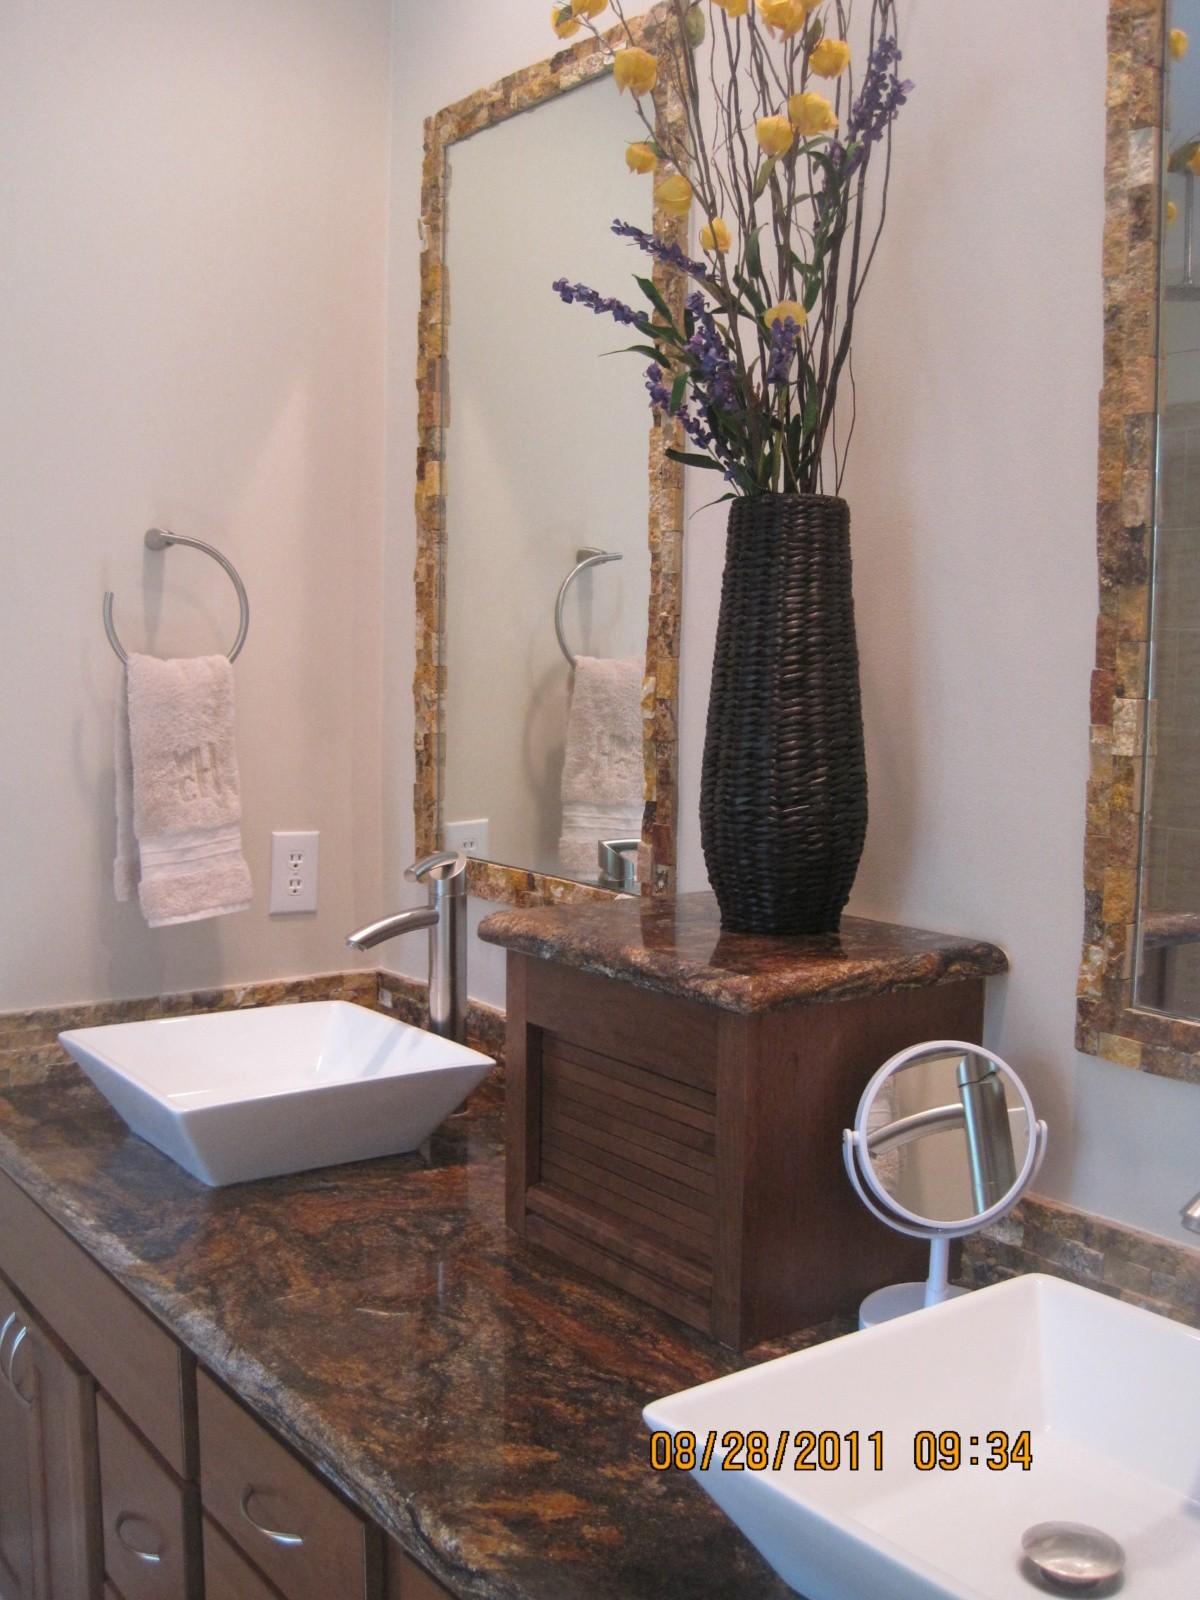 lava vanity with vessel sinks